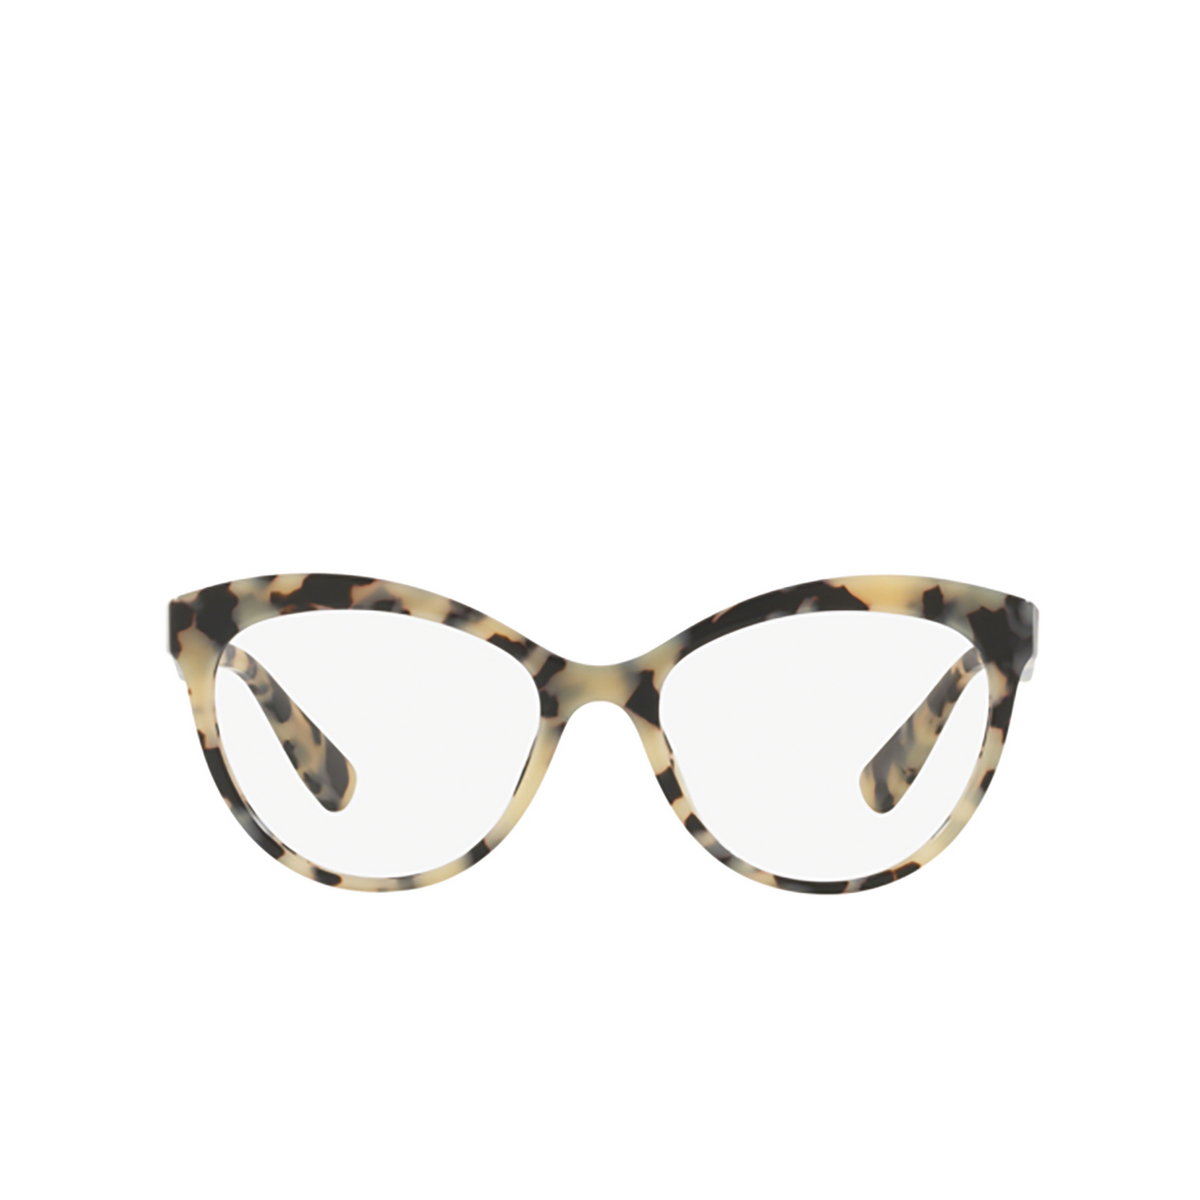 Miu Miu® Butterfly Eyeglasses: MU 04RV color Havana Sand Brown KAD1O1 - front view.